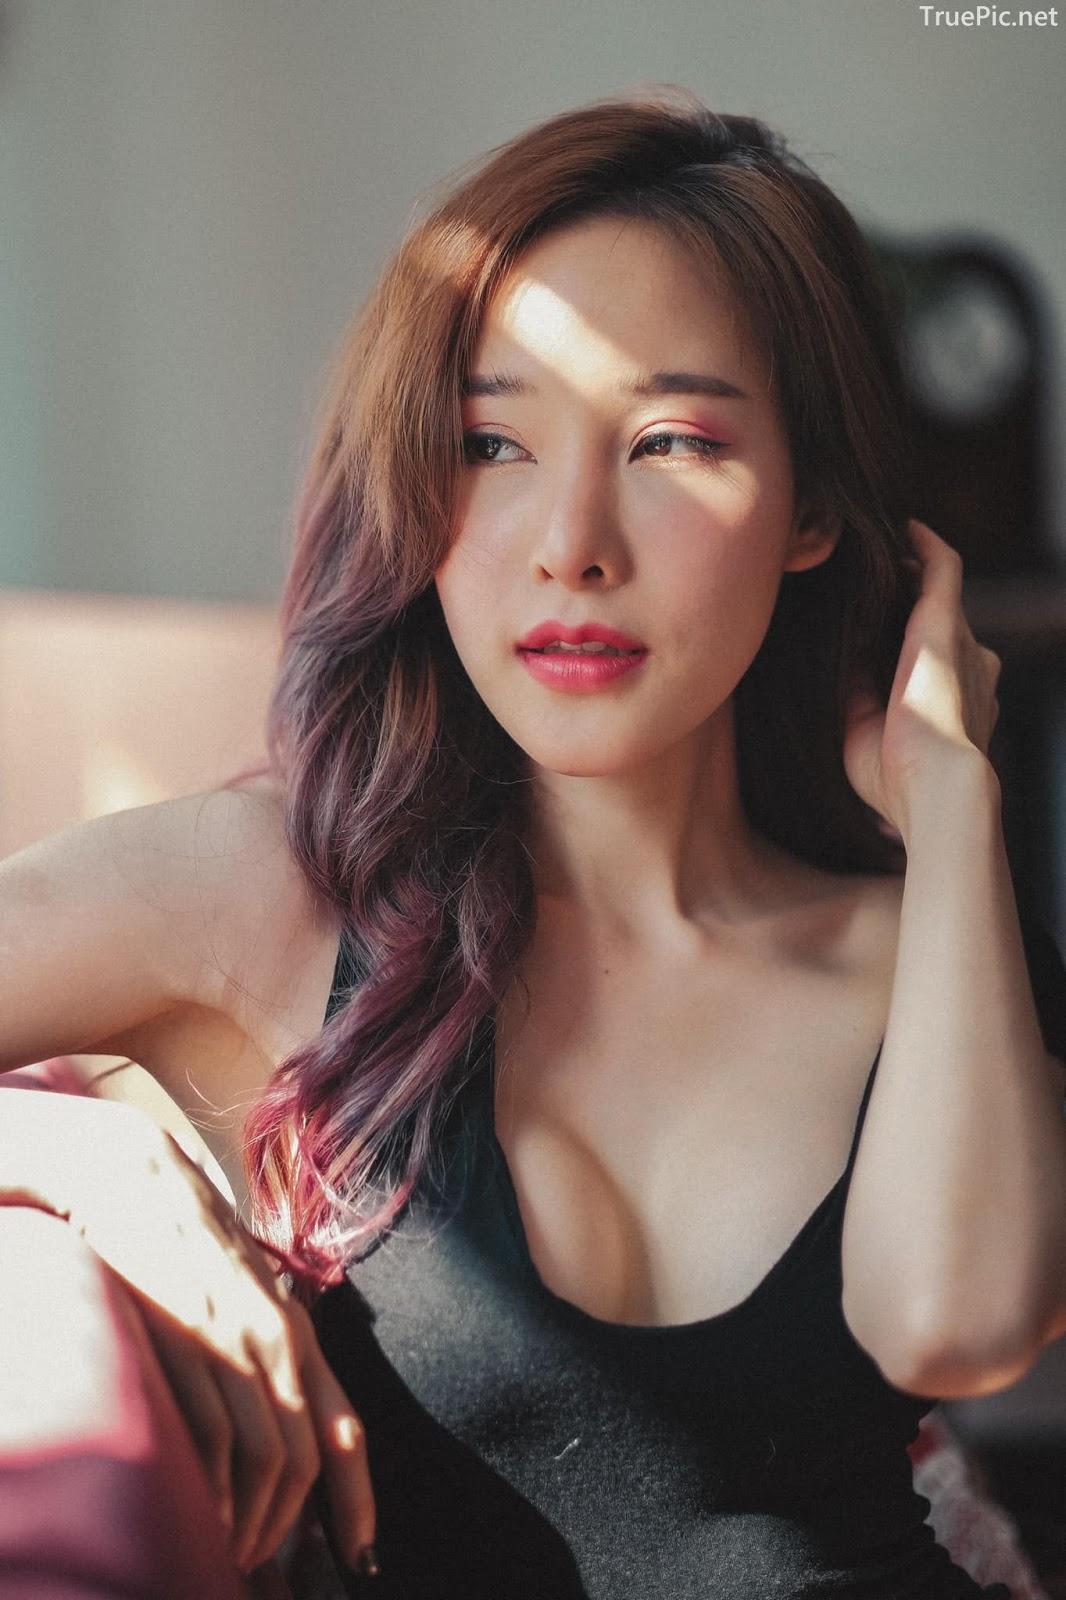 Thailand model - Arys Nam-in (Arysiacara) - Black Rose feeling the sun - Picture 1